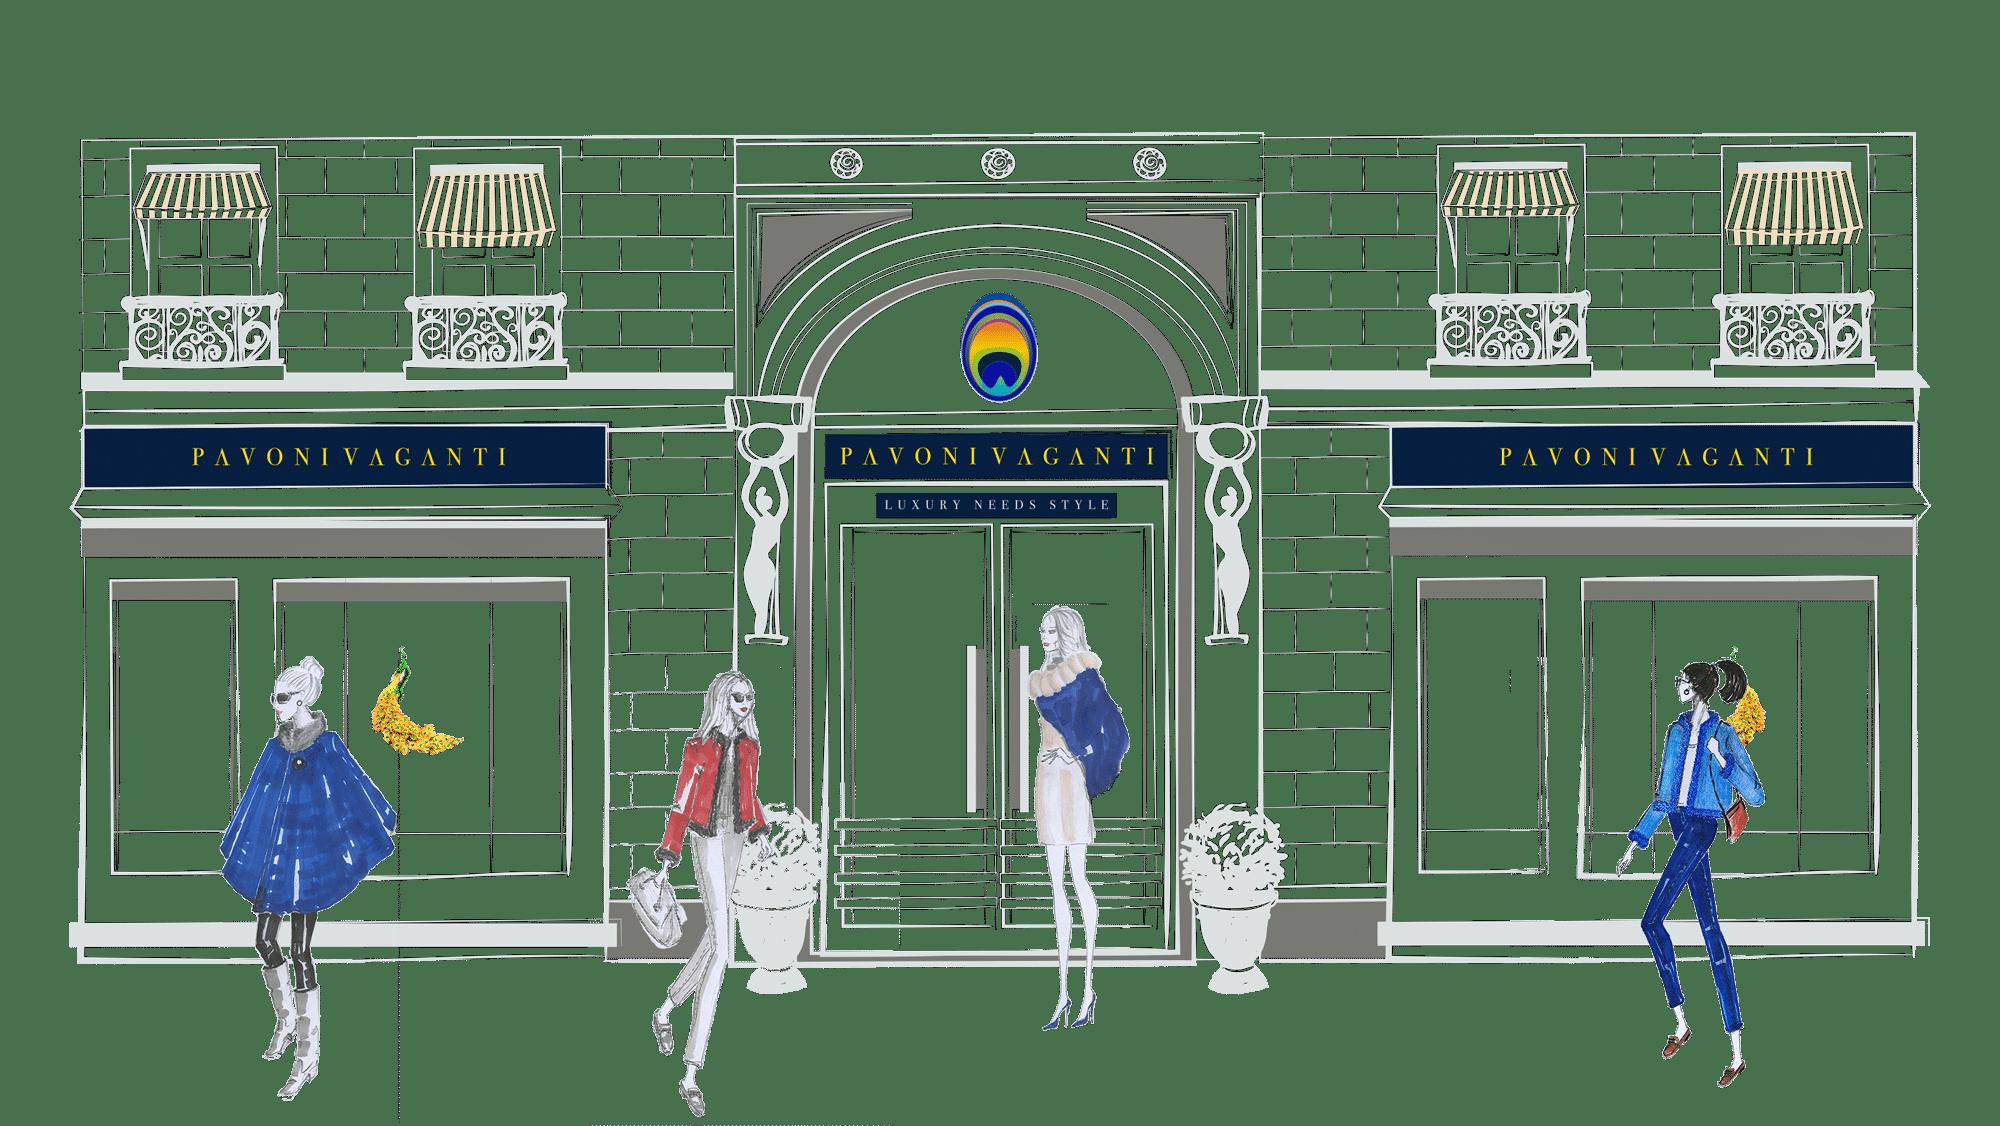 collection front store pavoni vaganti 6 1